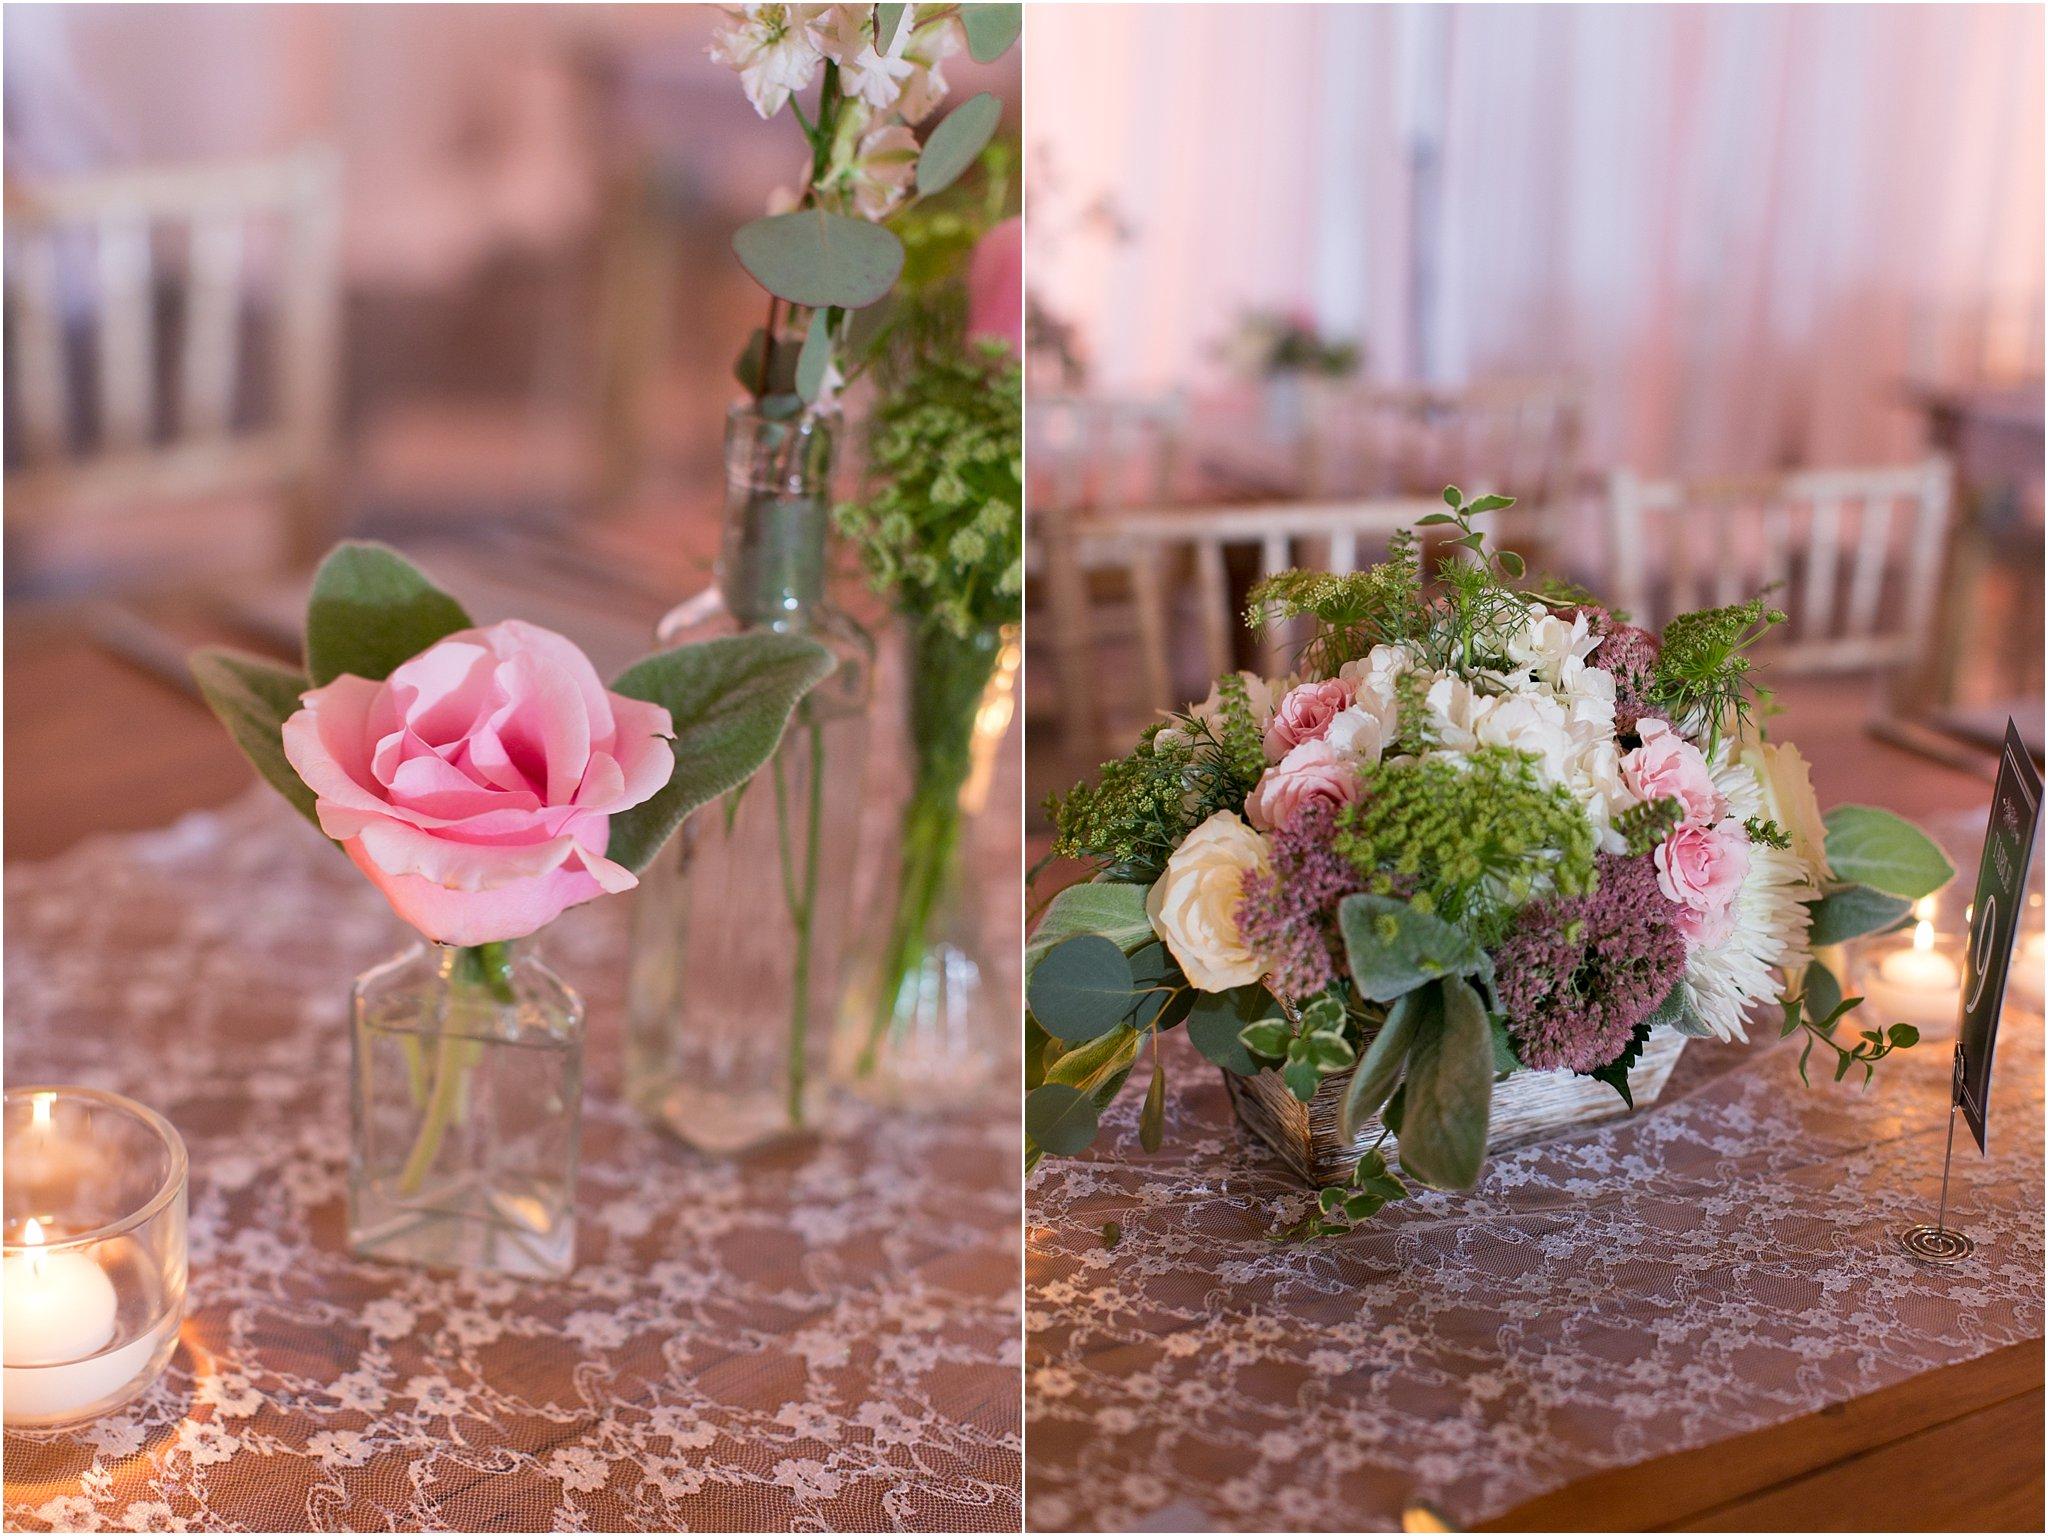 jessica_ryan_photography_virginia_wedding_photographer_wedding_hurricane_norfolk_botanical_gardens_hurricane_matthew_wedding_3619